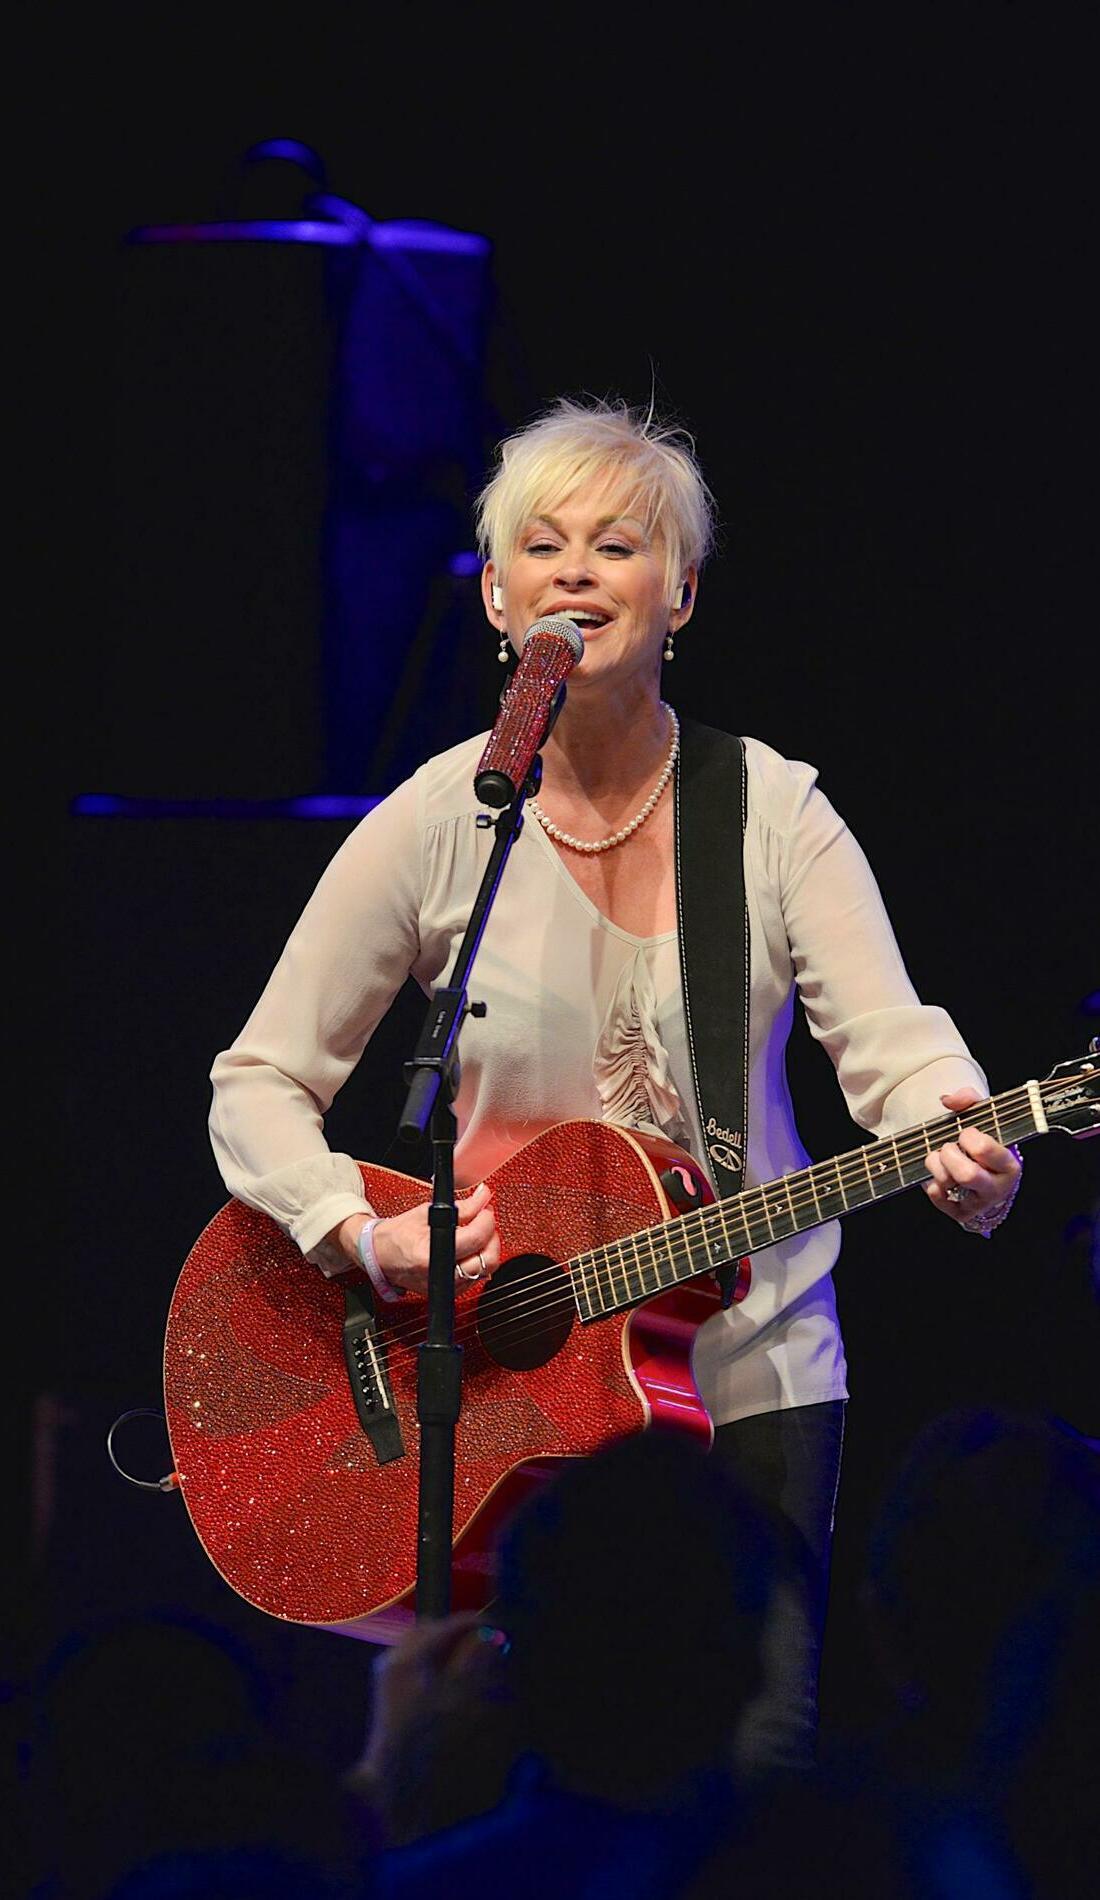 A Lorrie Morgan live event